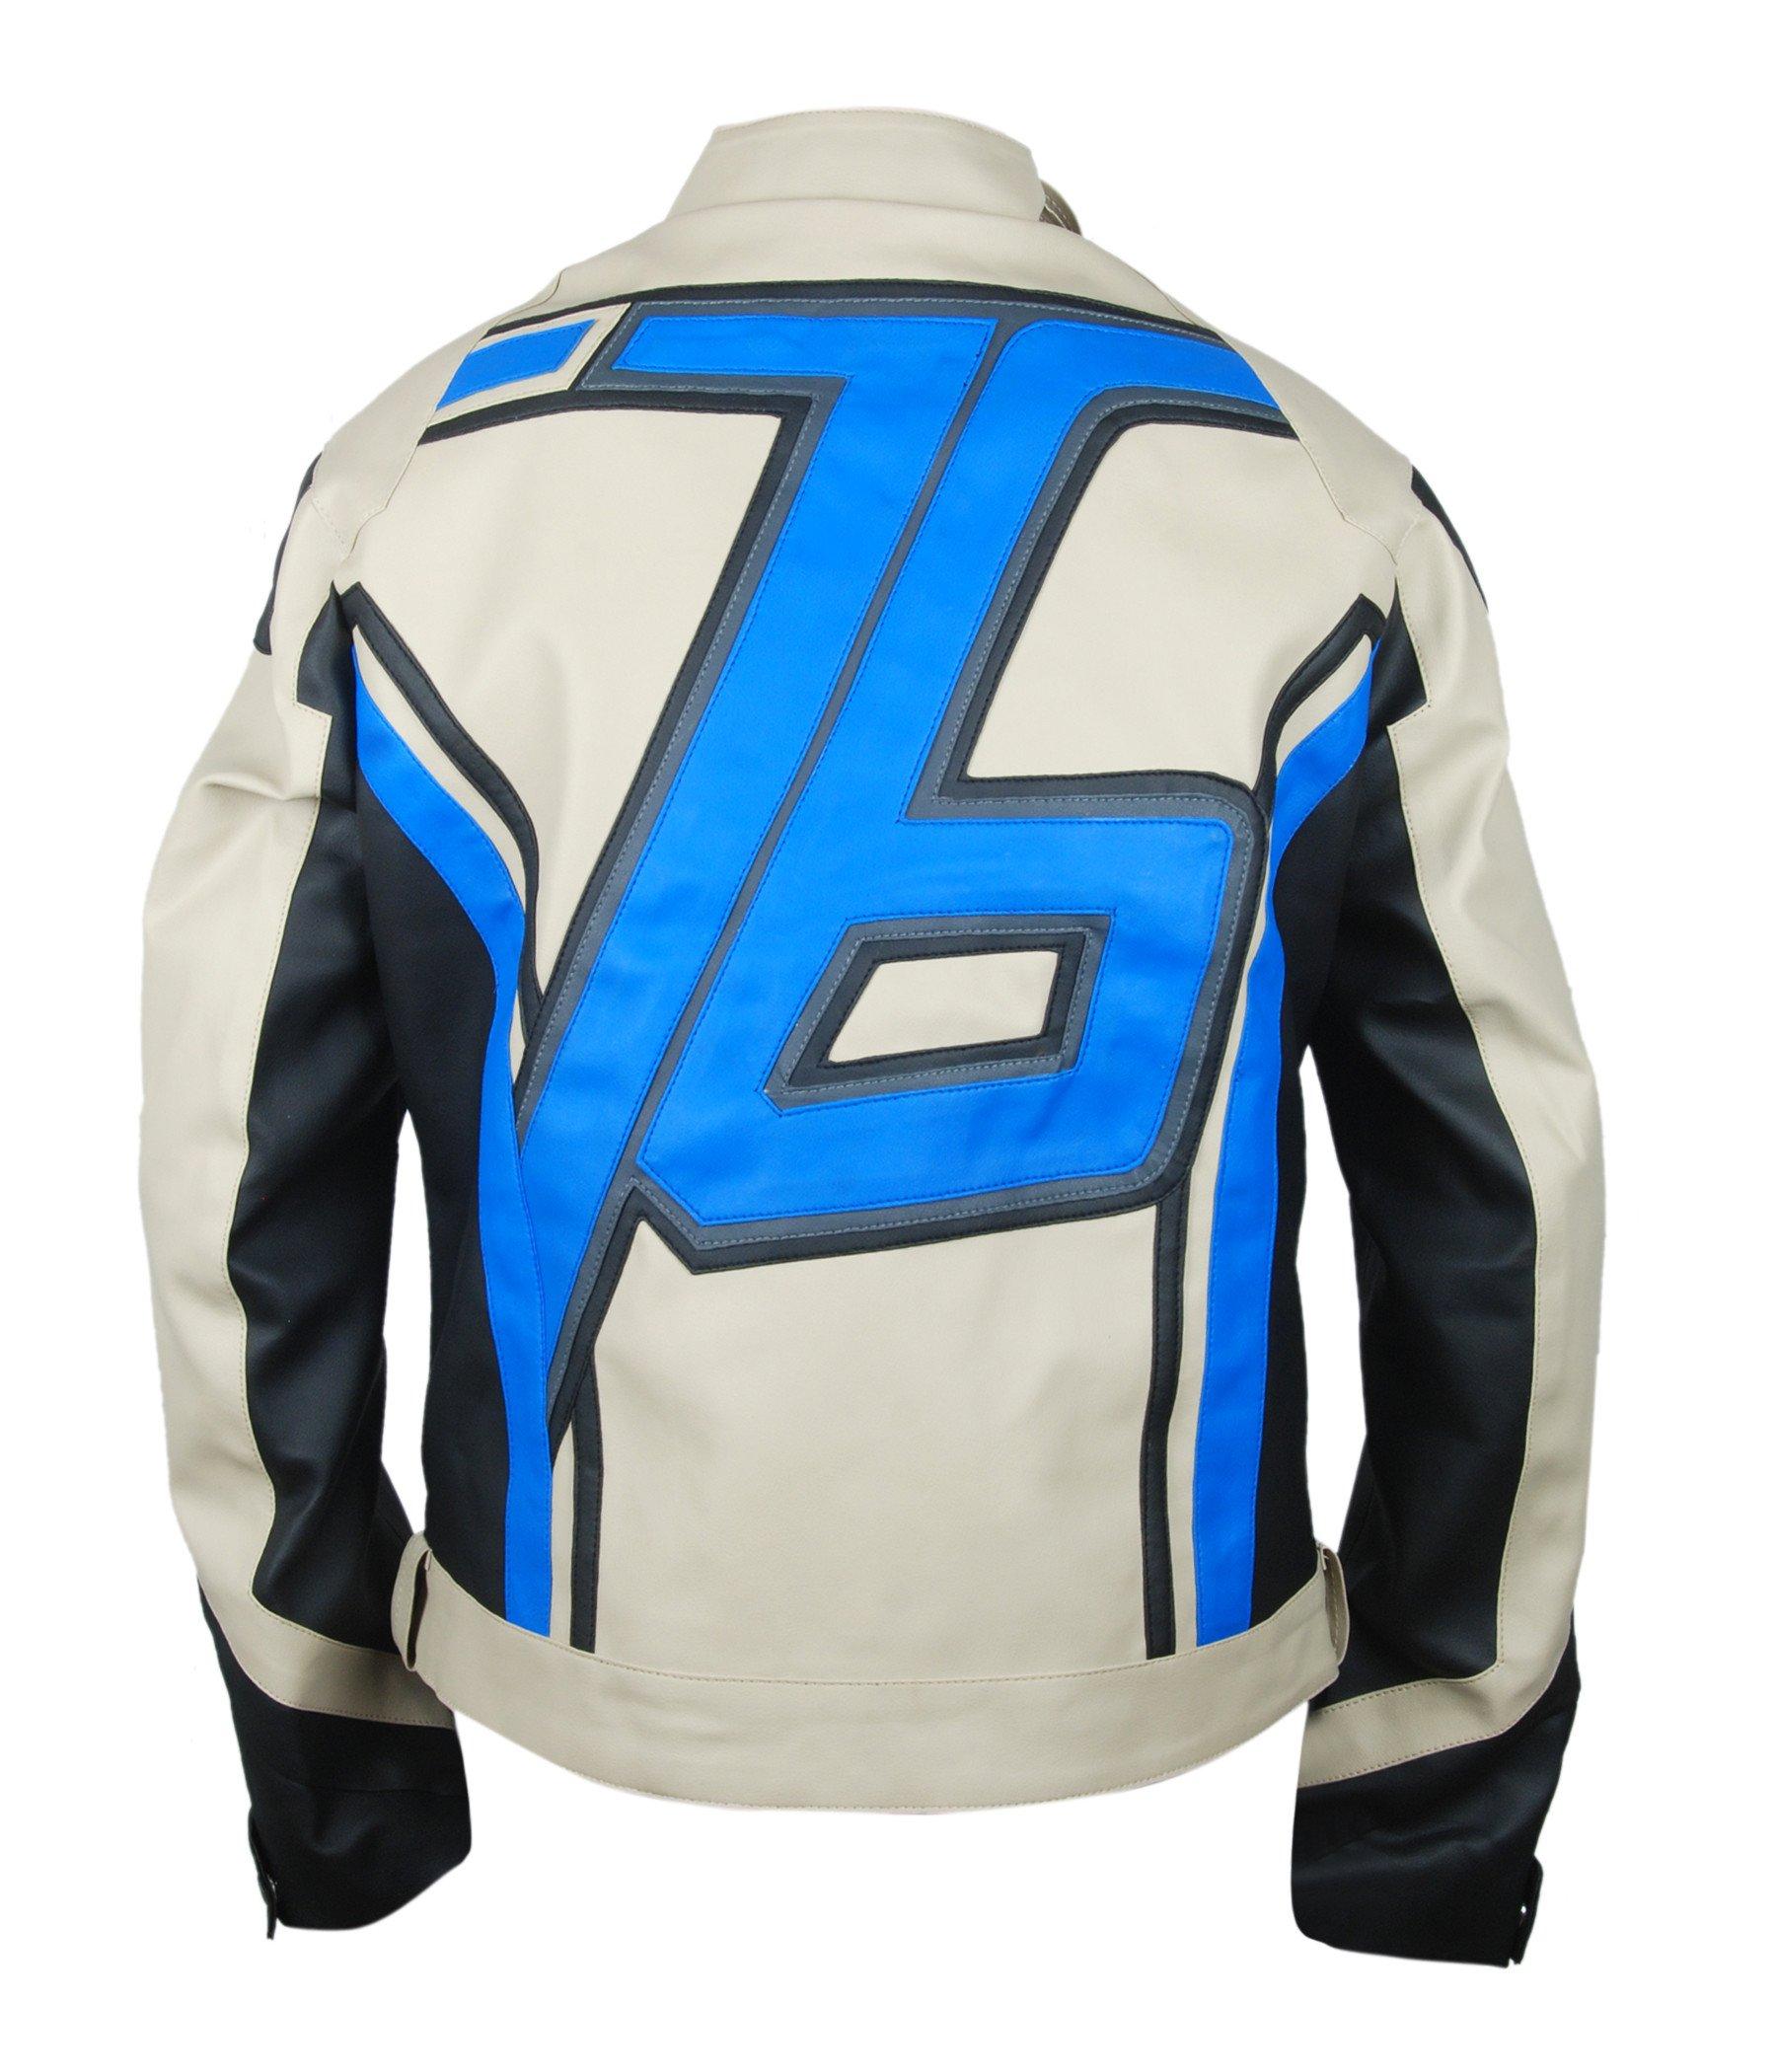 F&H Men's Beige Overwatch Soldier 76 John ''Jack'' Morrison Genuine Leather Jacket L Multi by Flesh & Hide